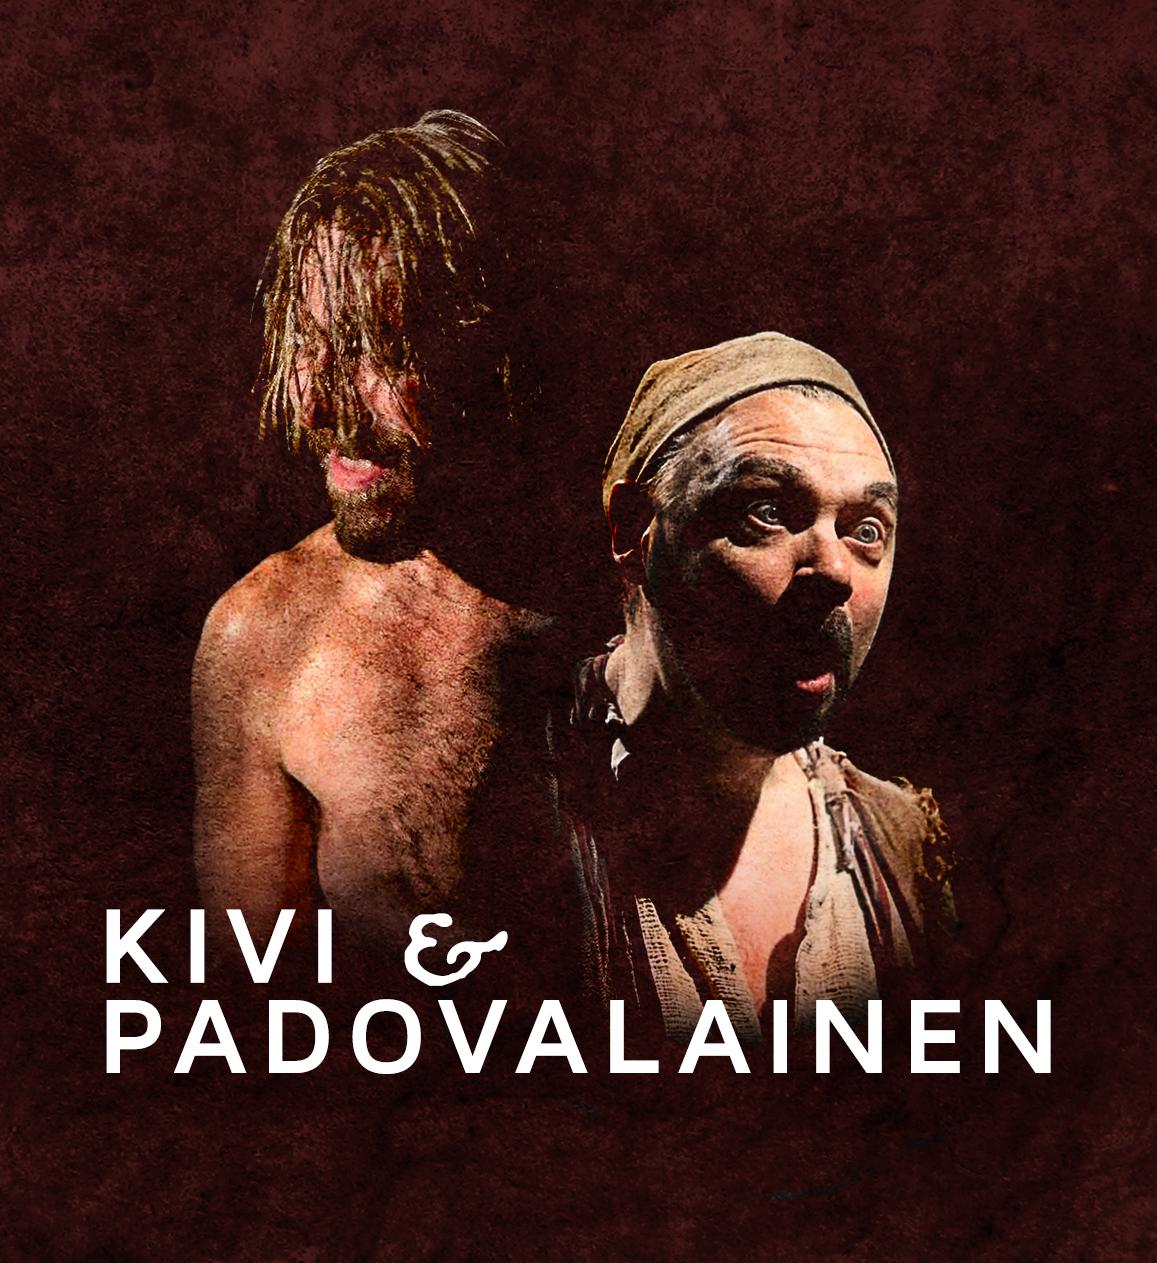 Kivi & Padovalainen